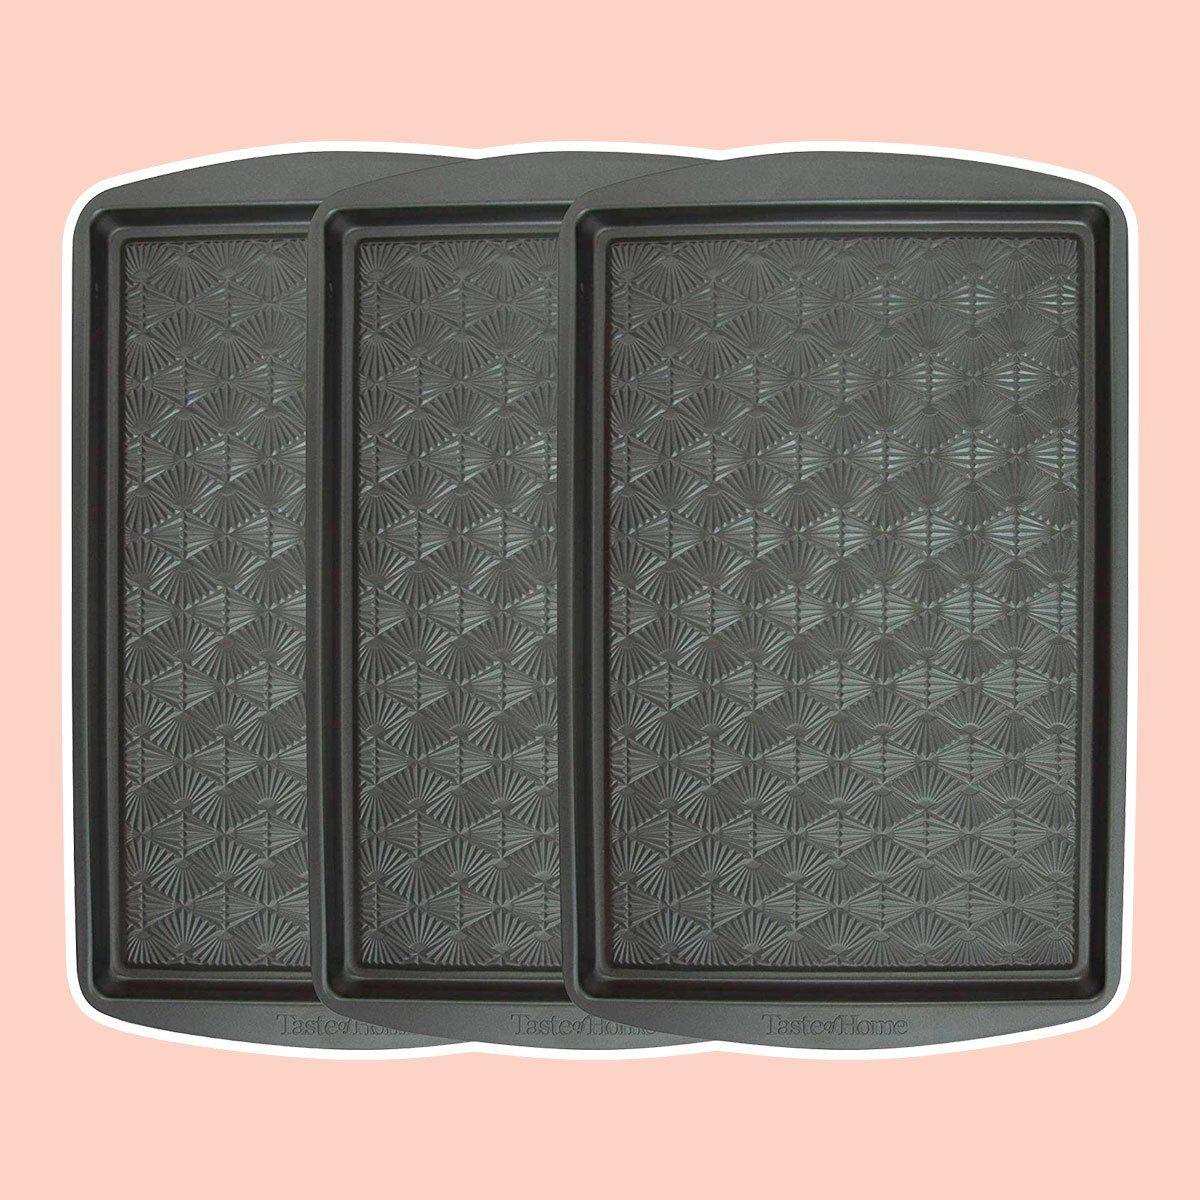 Taste of Home Set of 3-15 x 10 inch Non-Stick Metal Baking Sheet